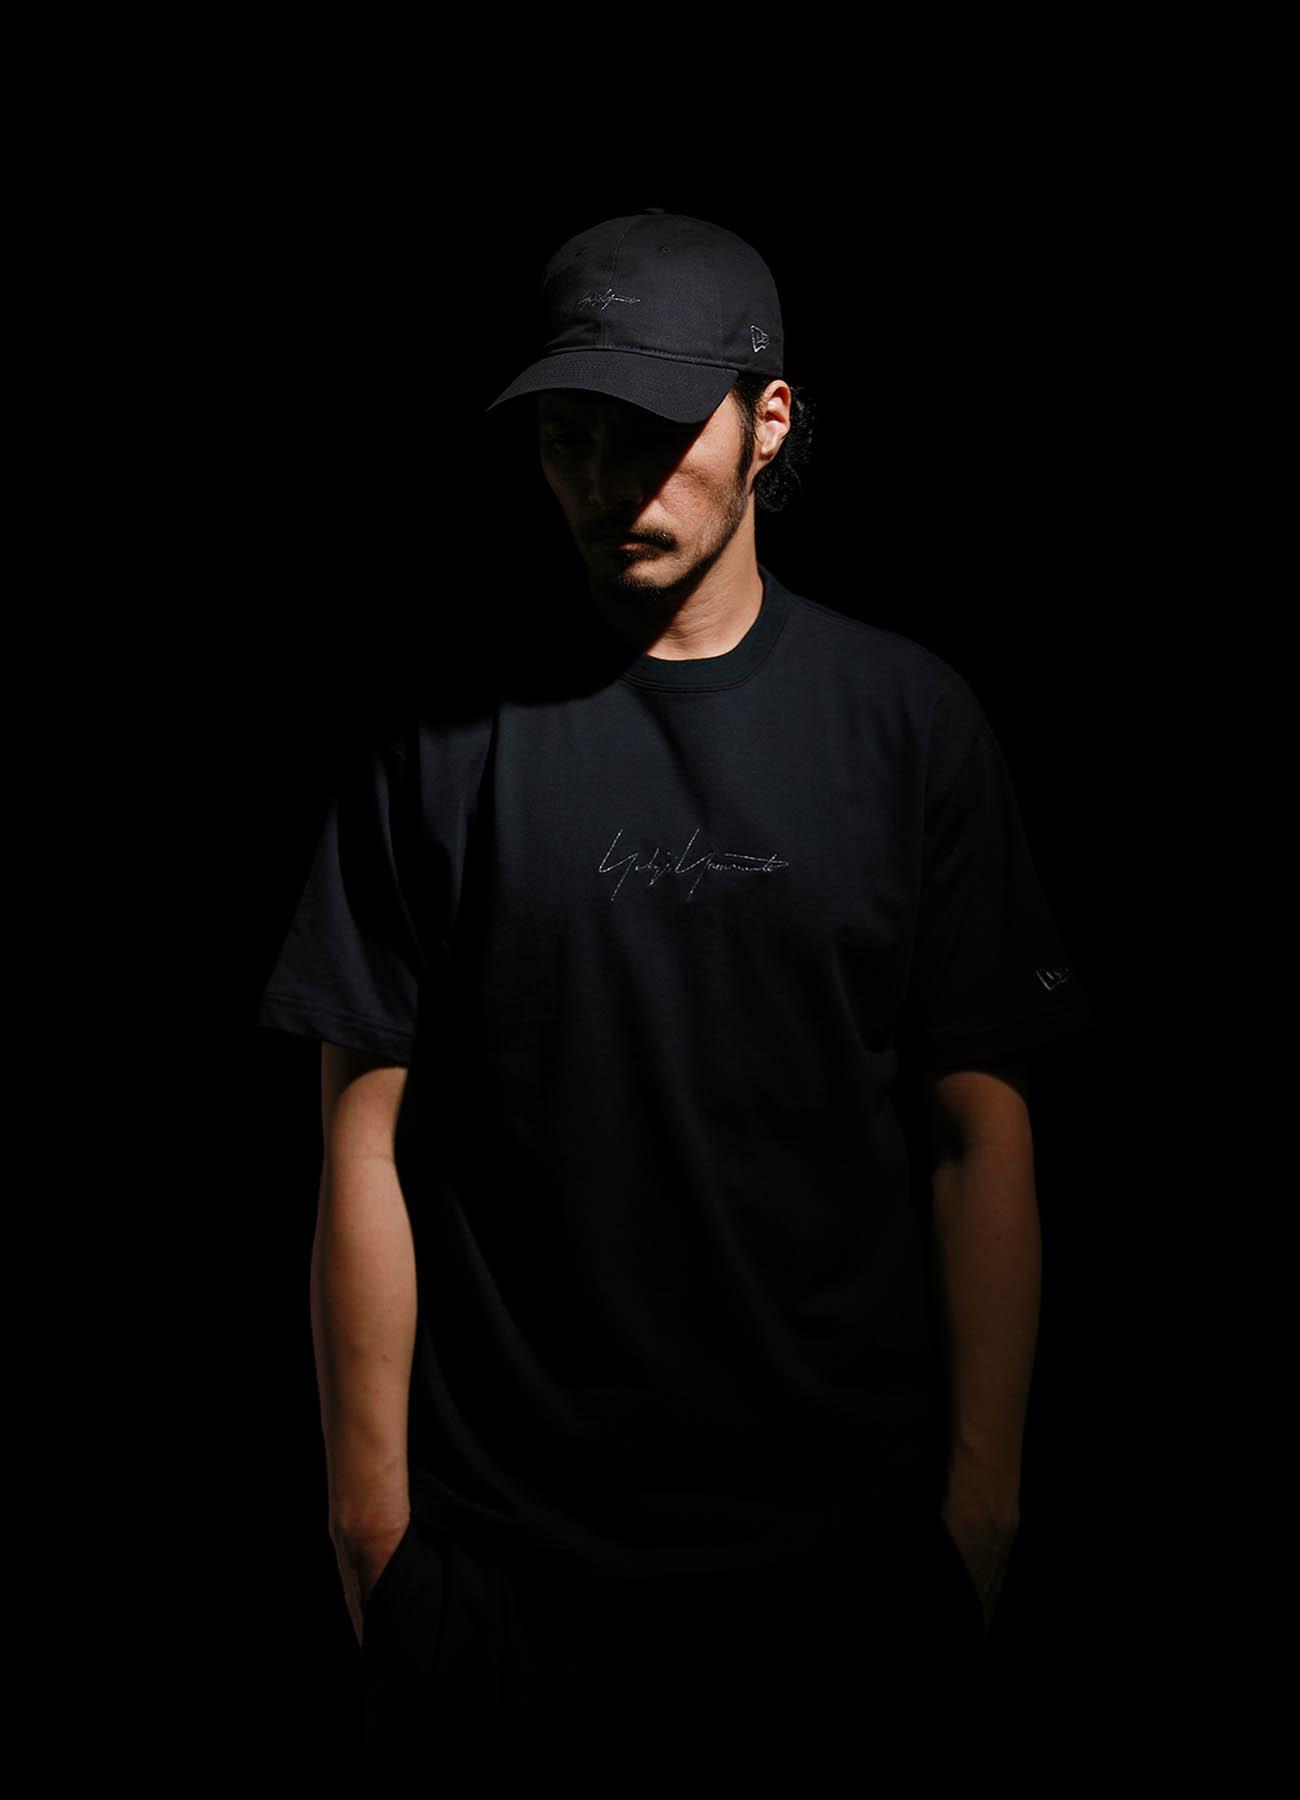 Yohji Yamamoto × New Era METALLIC BLACK SIGNATURE CAP KEY HOLDER